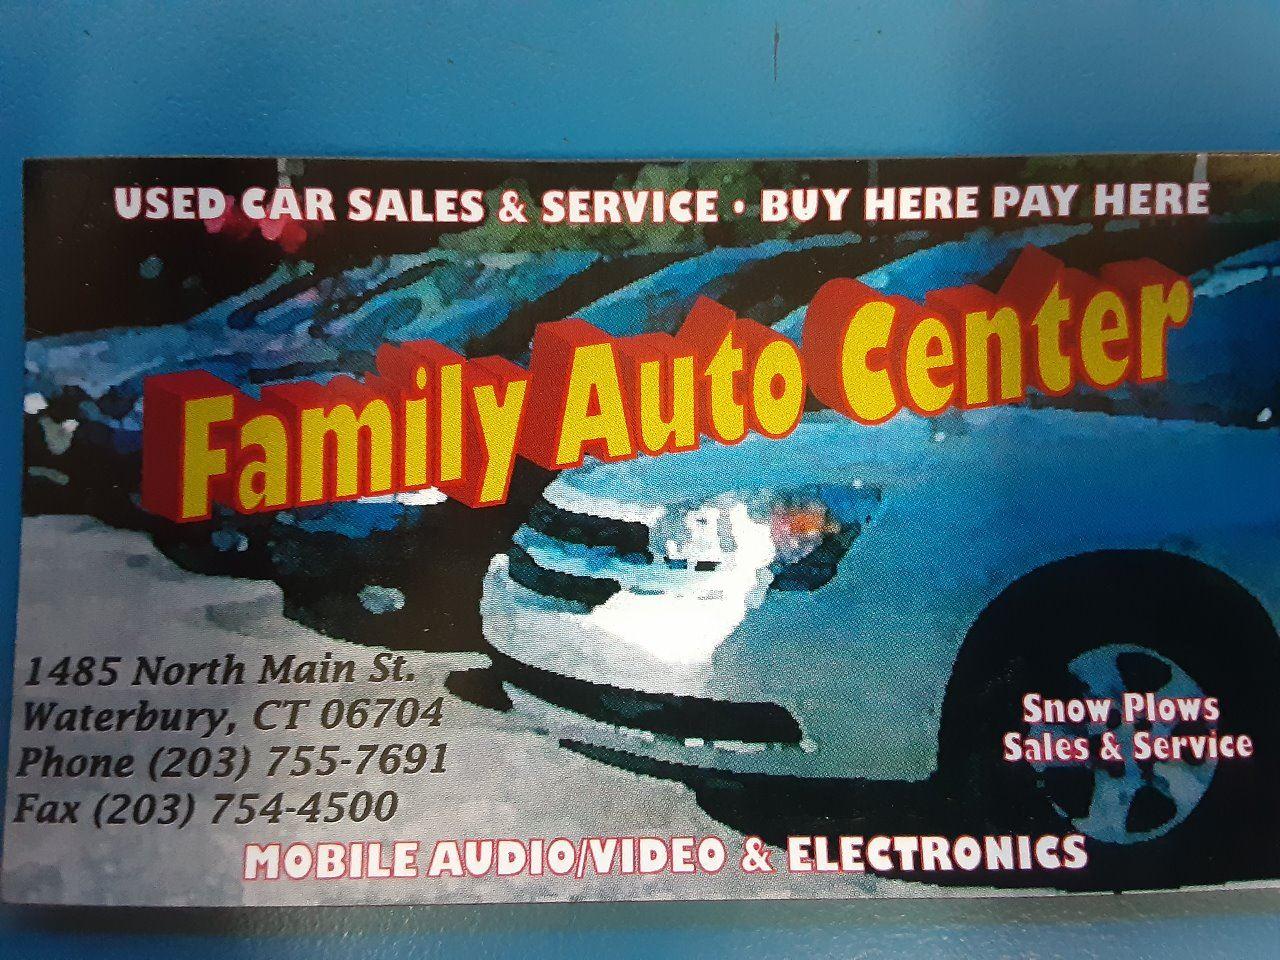 Family Auto Center